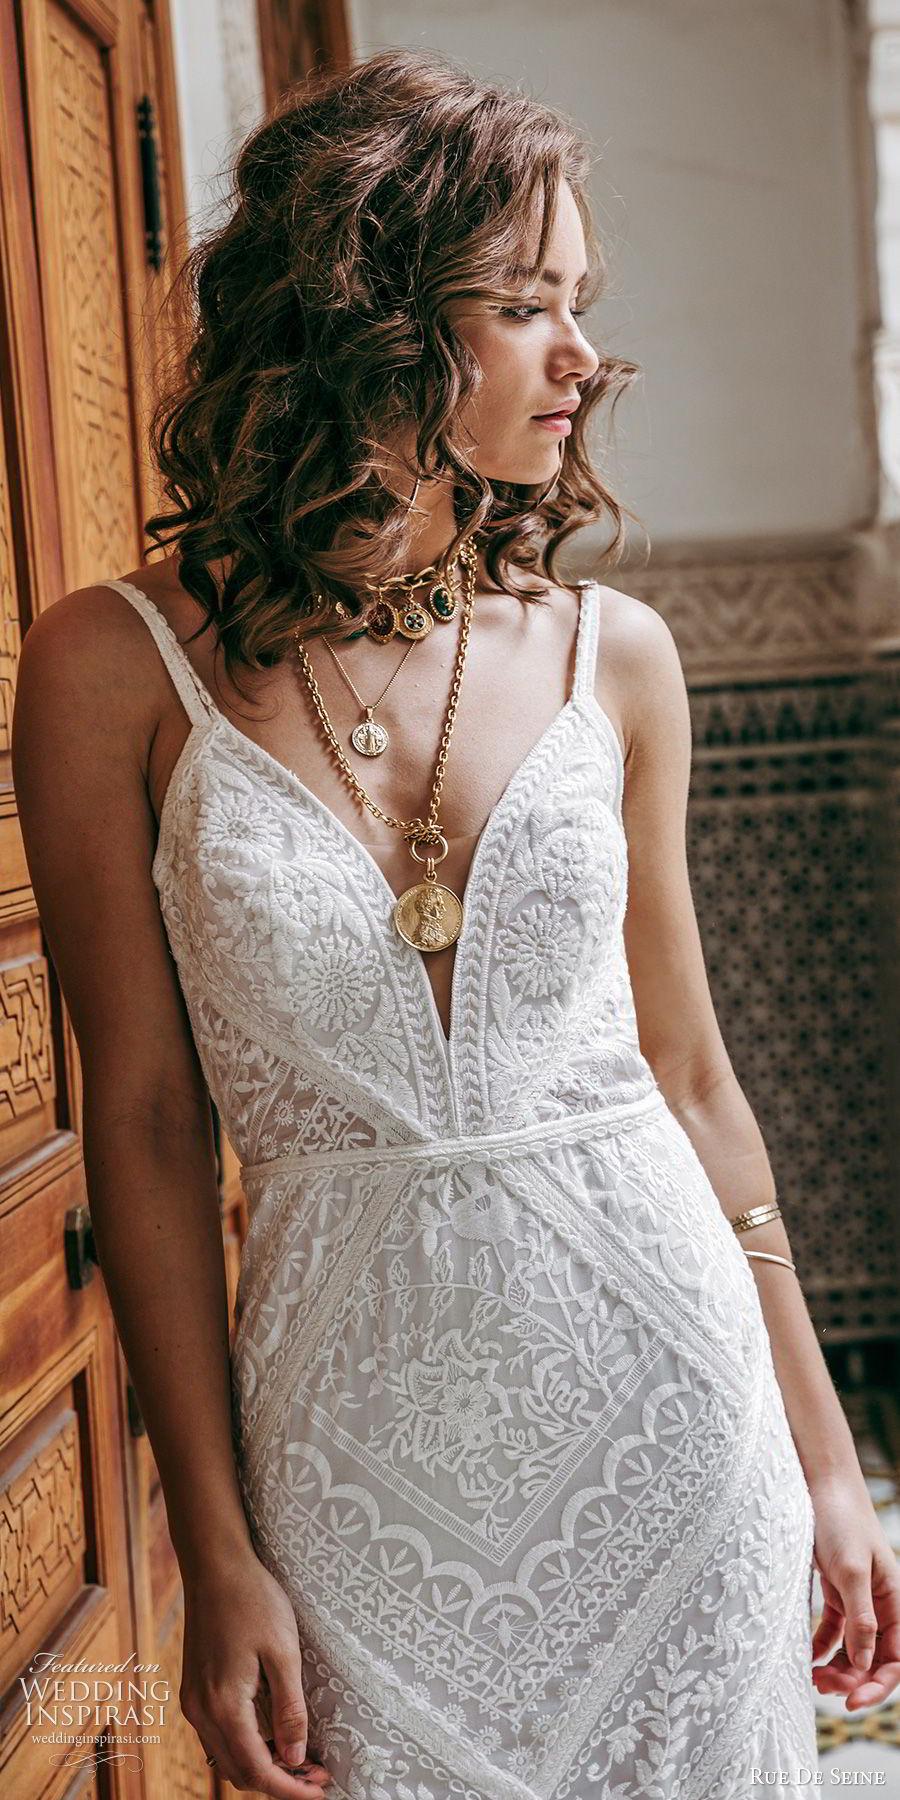 rue de seine 2019 bridal sleeveless thick straps deep v neckline lace fit flare sheath wedding dress (11) boho chic romantic open back chapel train zv